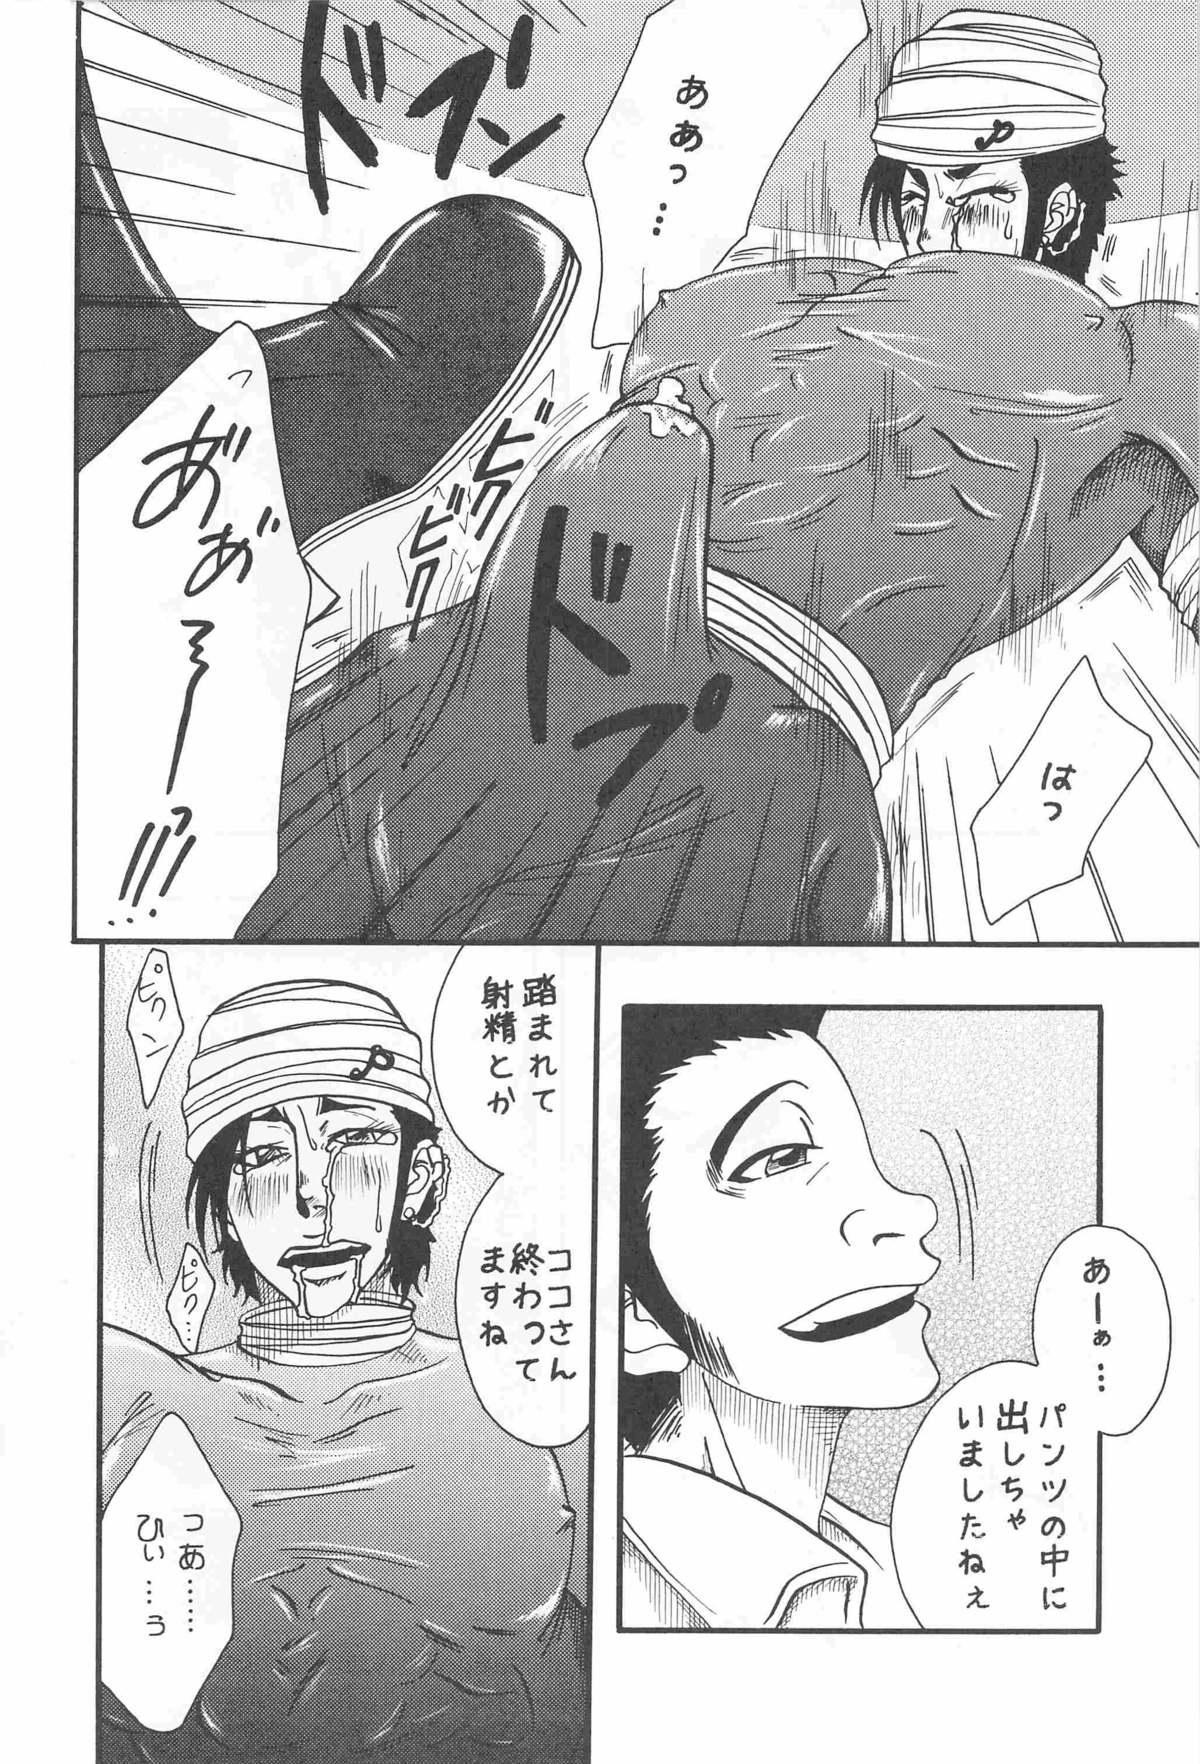 [Kijima Hyougo,Jun'ai Meringue-don,RIN!] [msbt] (Toriko) 21